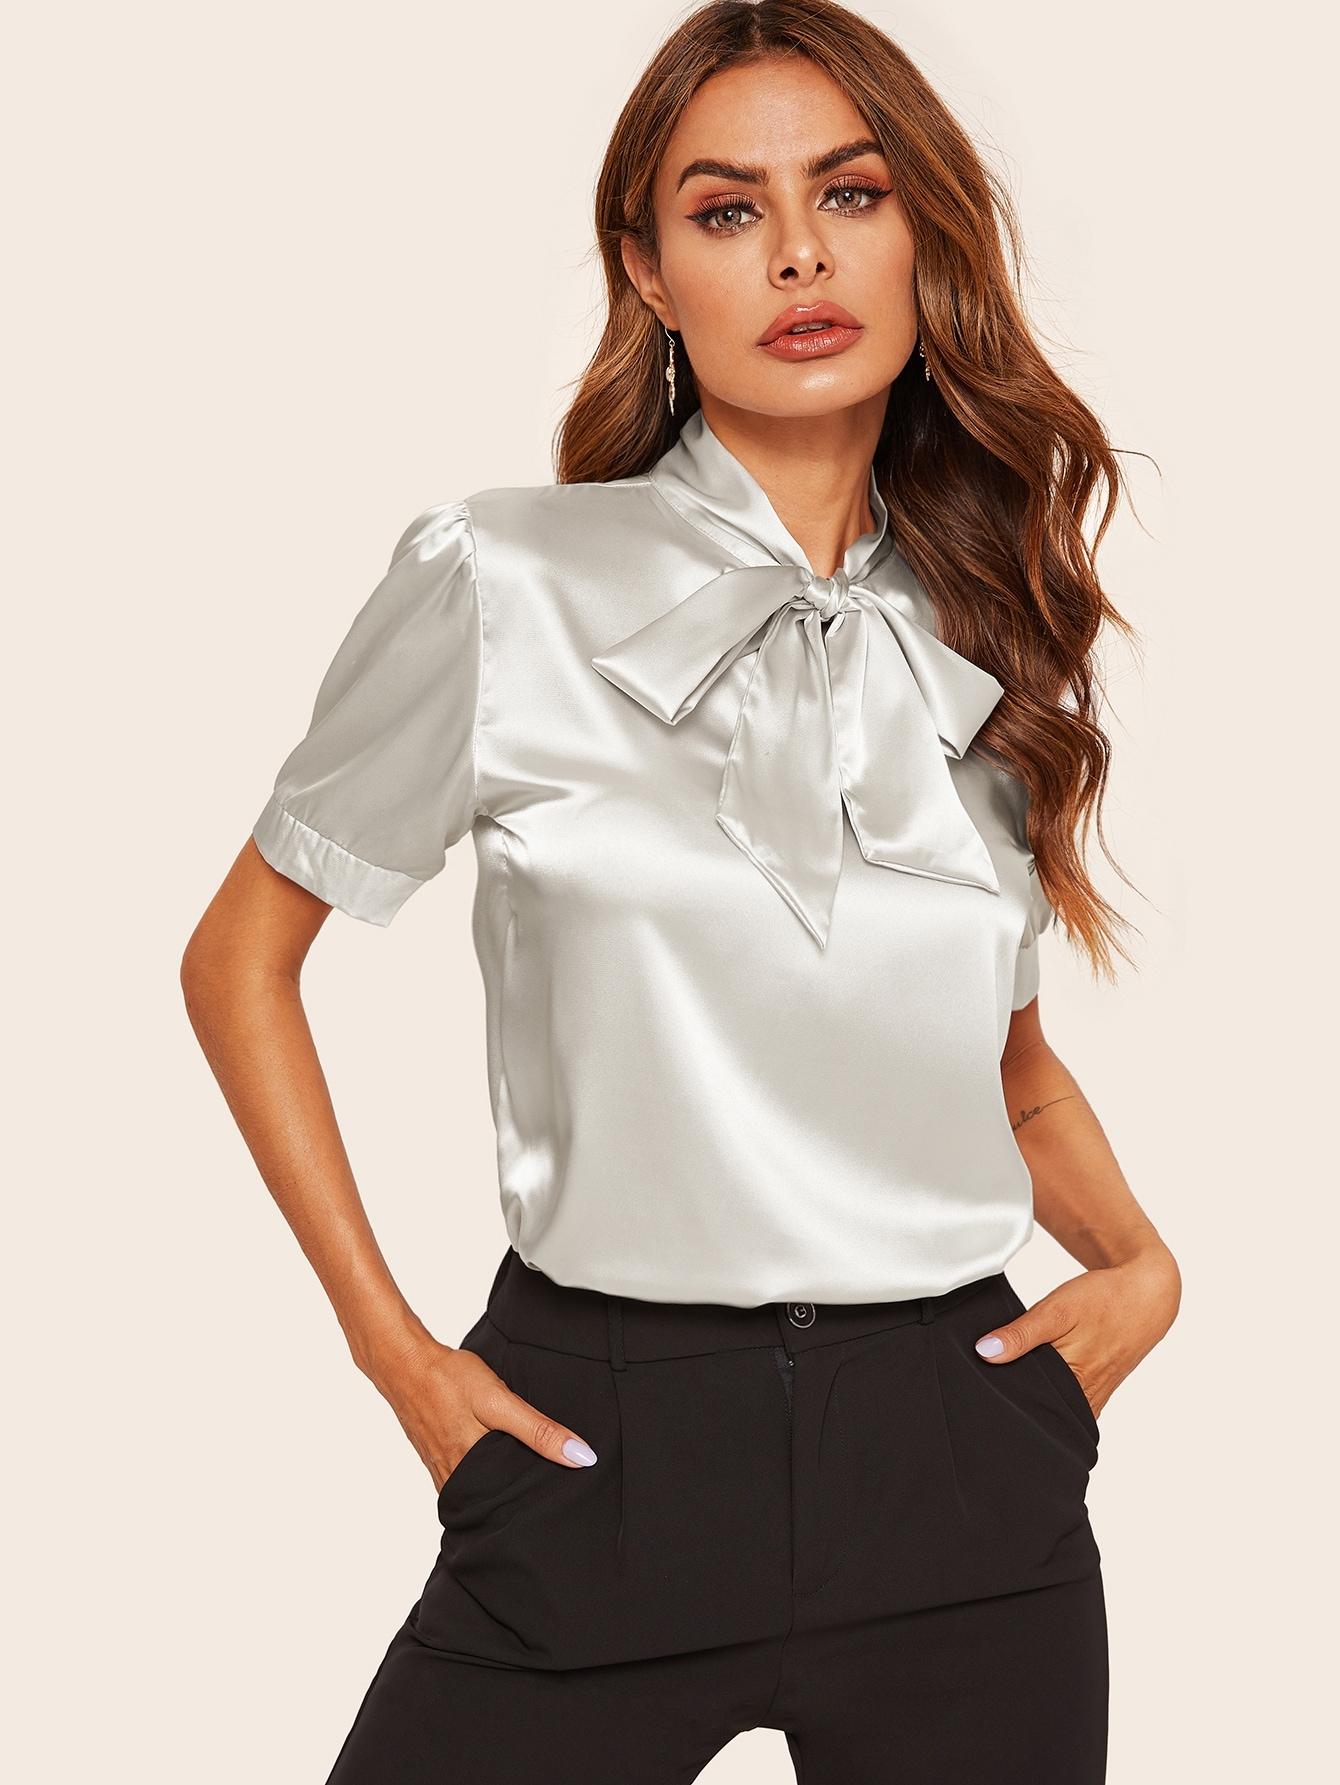 Фото - Атласная блуза с завязкой на шее от SheIn серого цвета